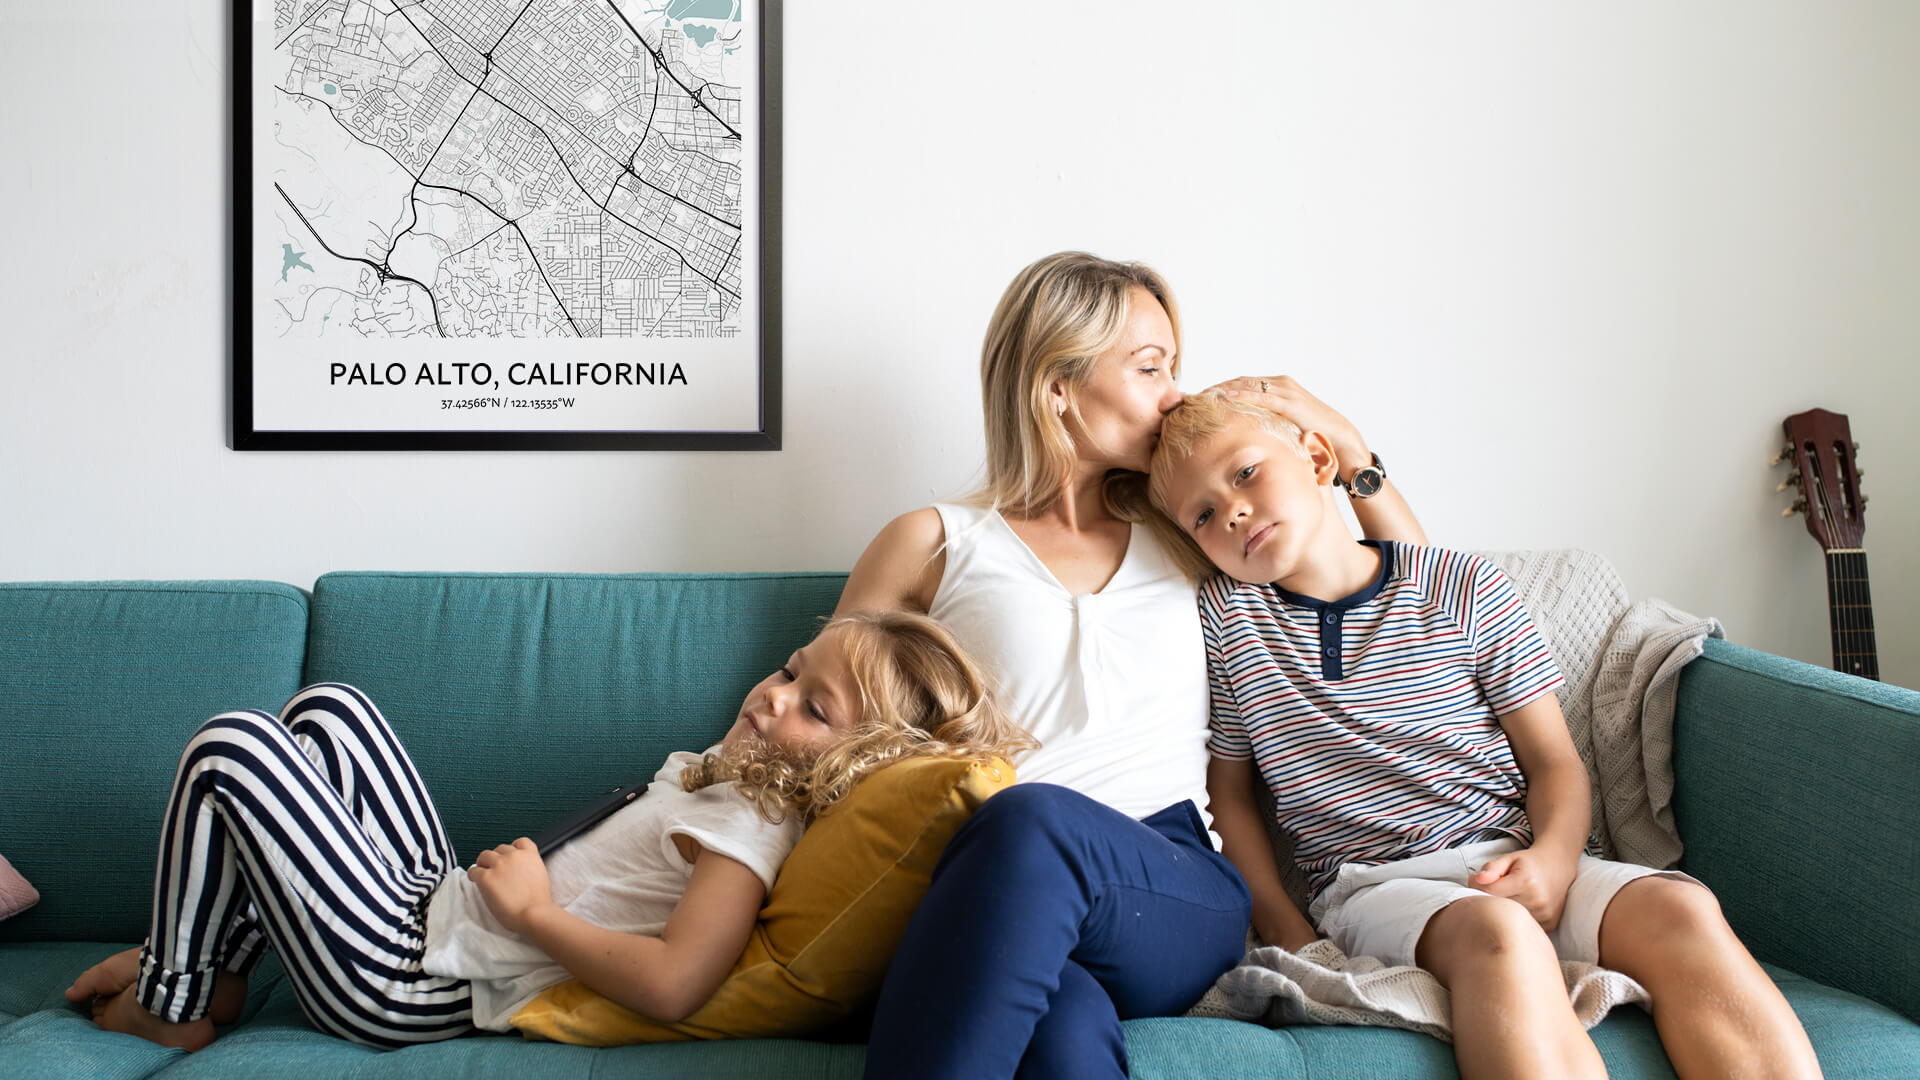 Palo Alto map poster